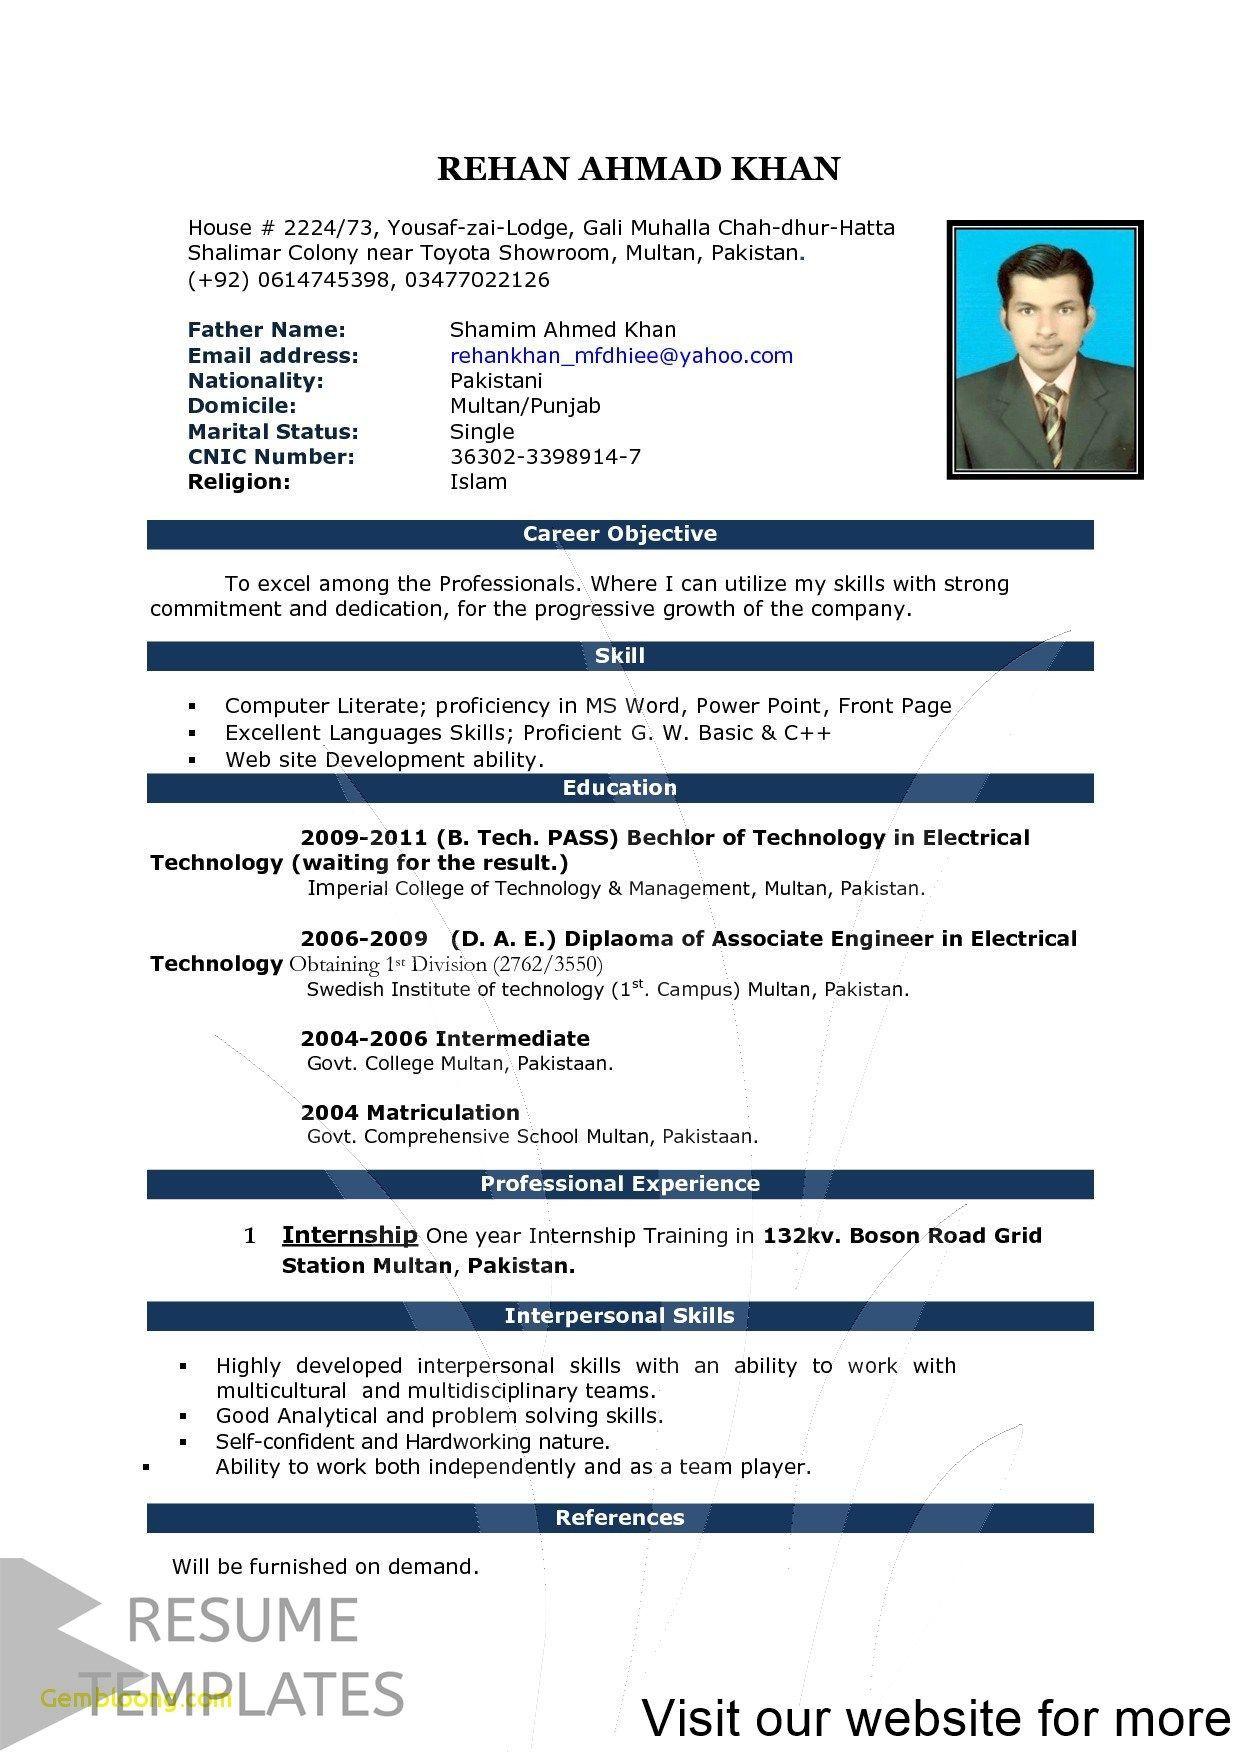 Resume Template Free Resume Template Professional Resume Examples Simple Resume Job Resume Template Free Resume Template Word Microsoft Word Resume Template Internship resume template microsoft word